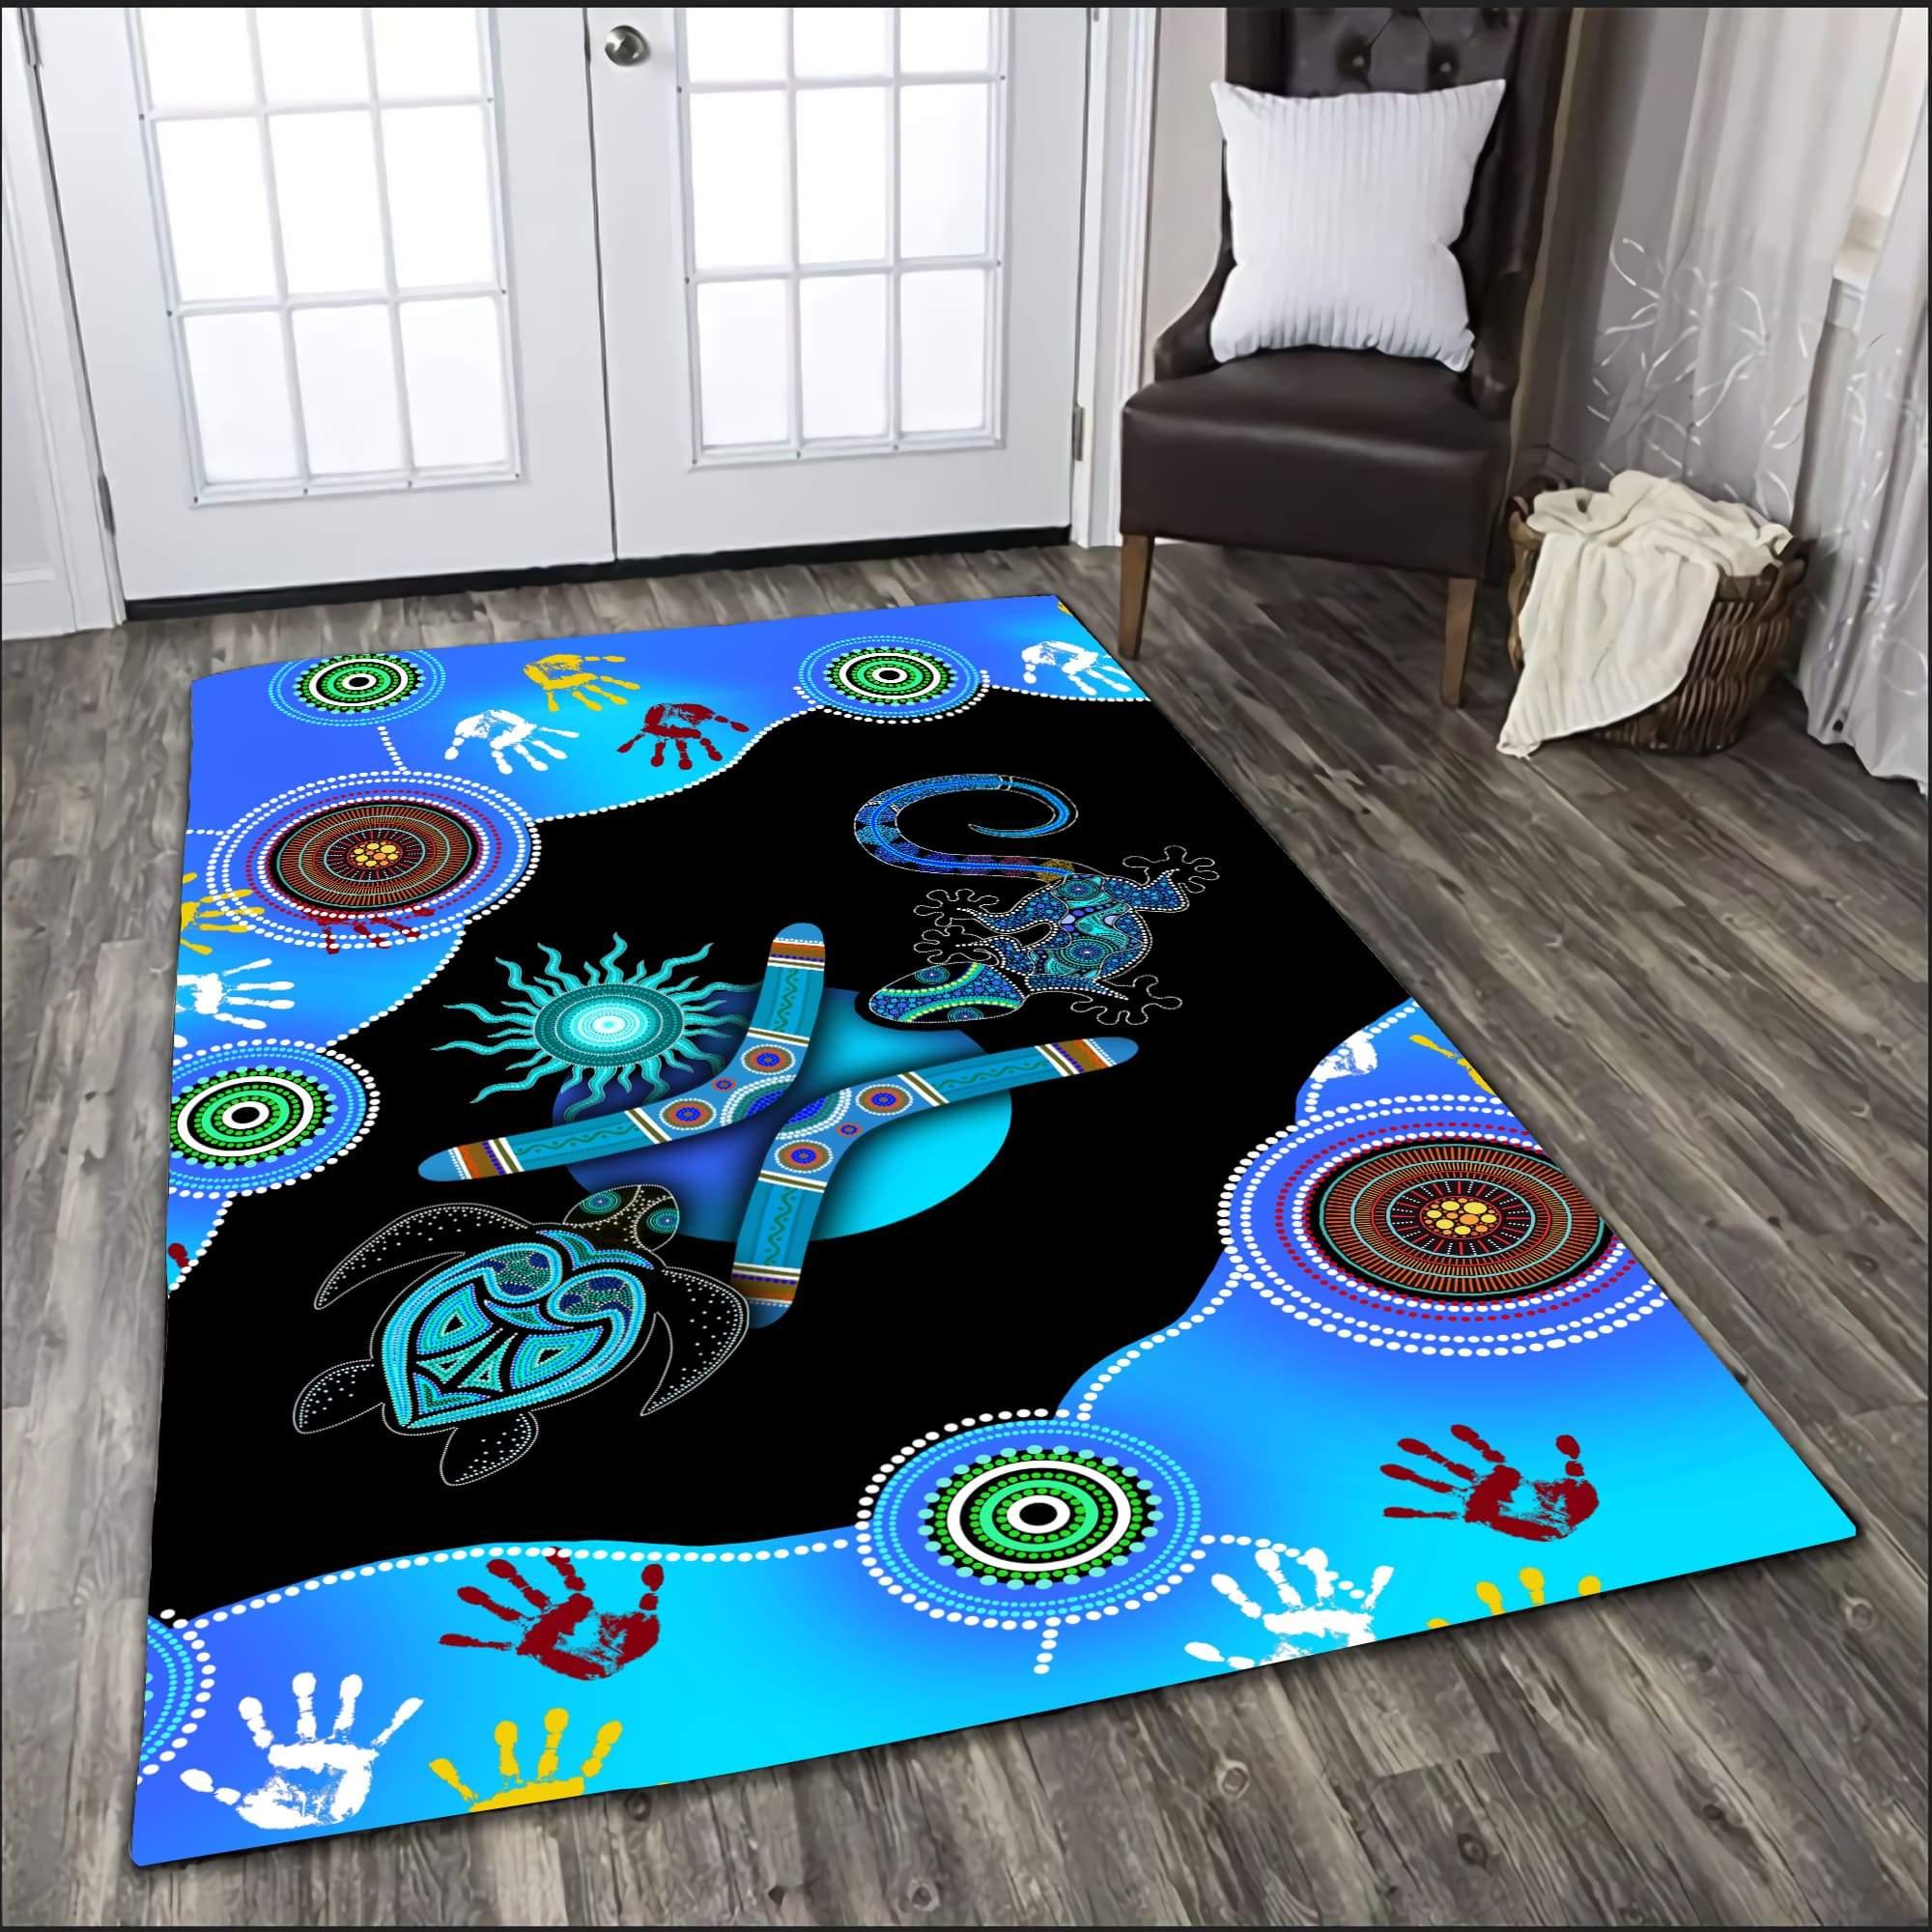 5 Aboriginal Naidoc Week 2021 Blue Turtle Lizard 3D print Rug 1